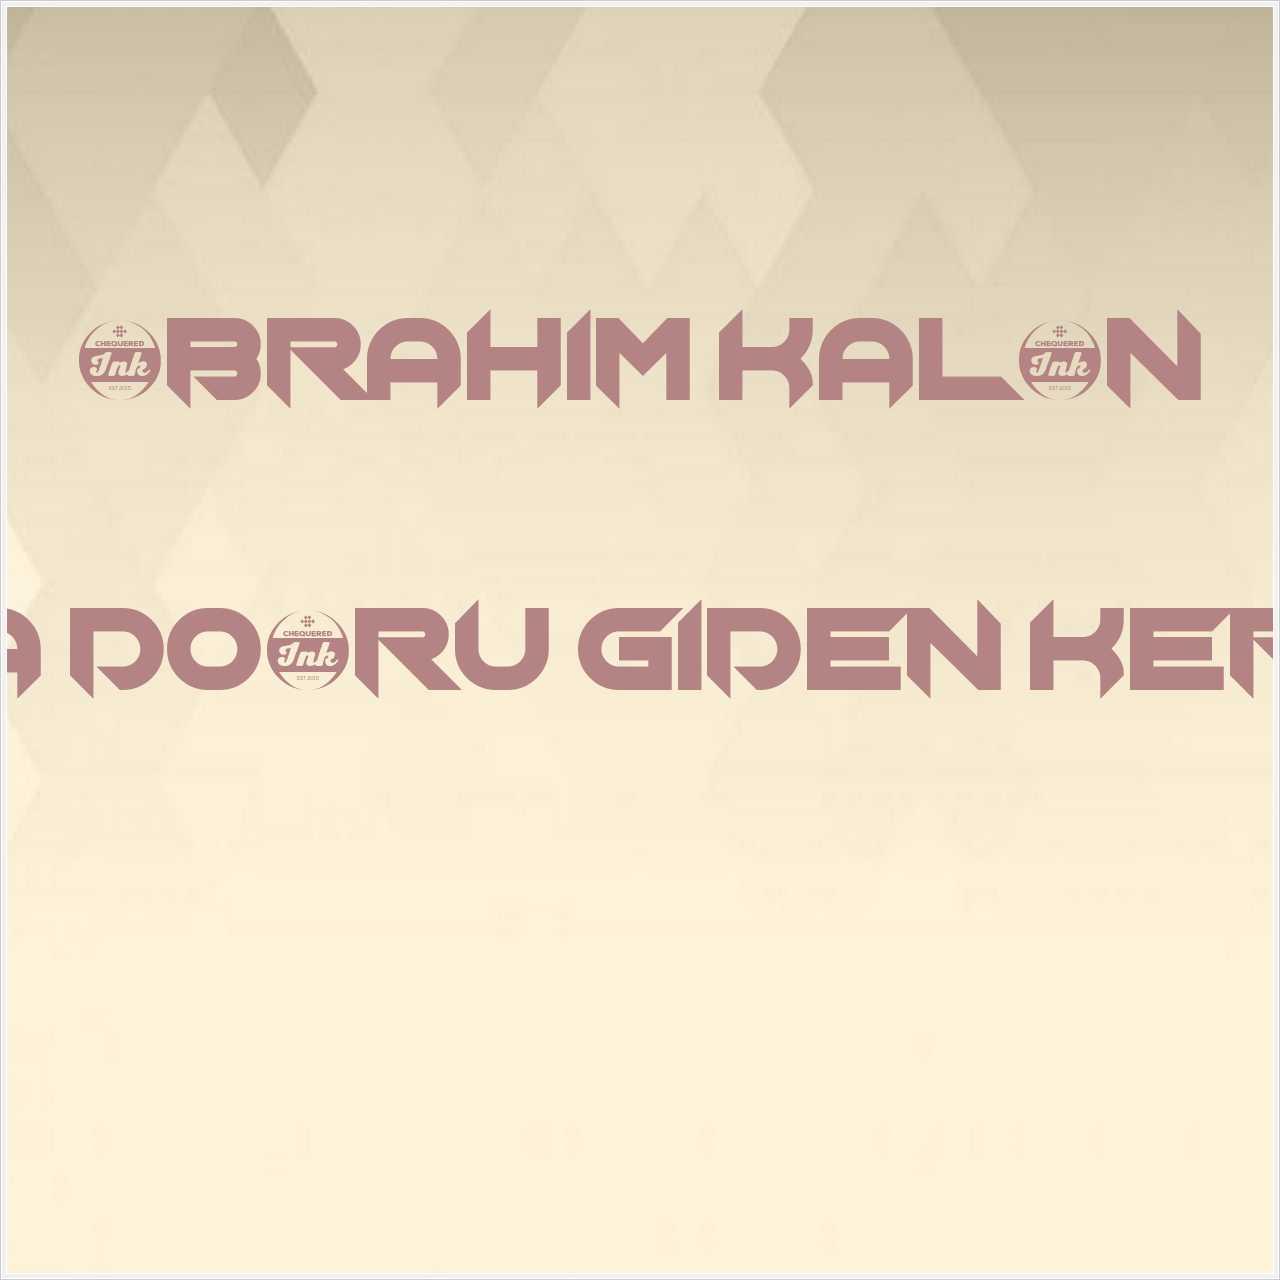 دانلود آهنگ جدید İbrahim Kalın به نام Şaha Doğru Giden Kervan